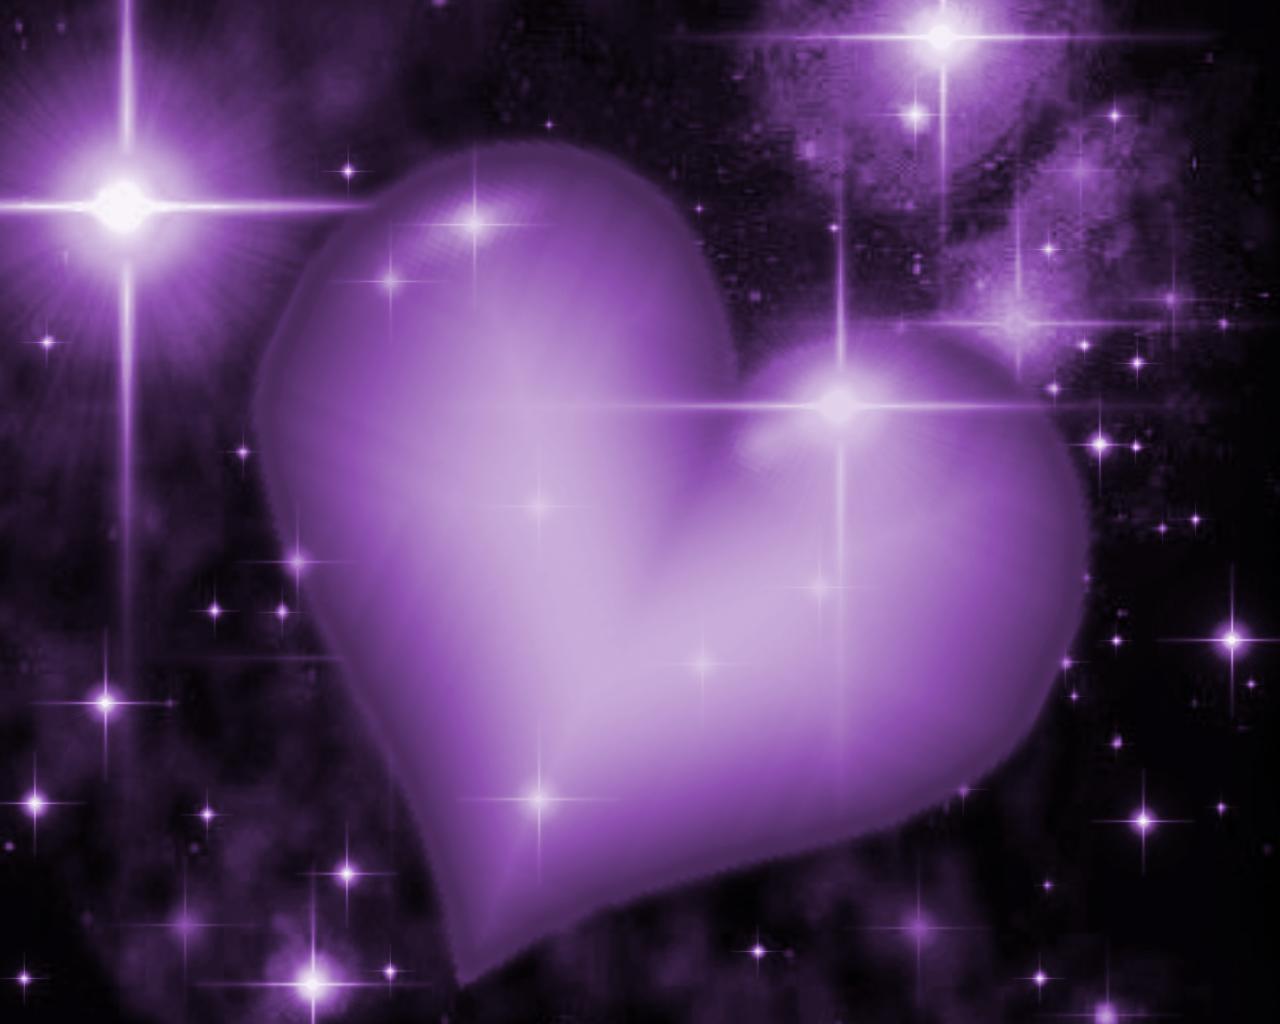 Purple And Black Hearts Wallpaper: Desktop Backgrounds 4U: Purple Backgrounds